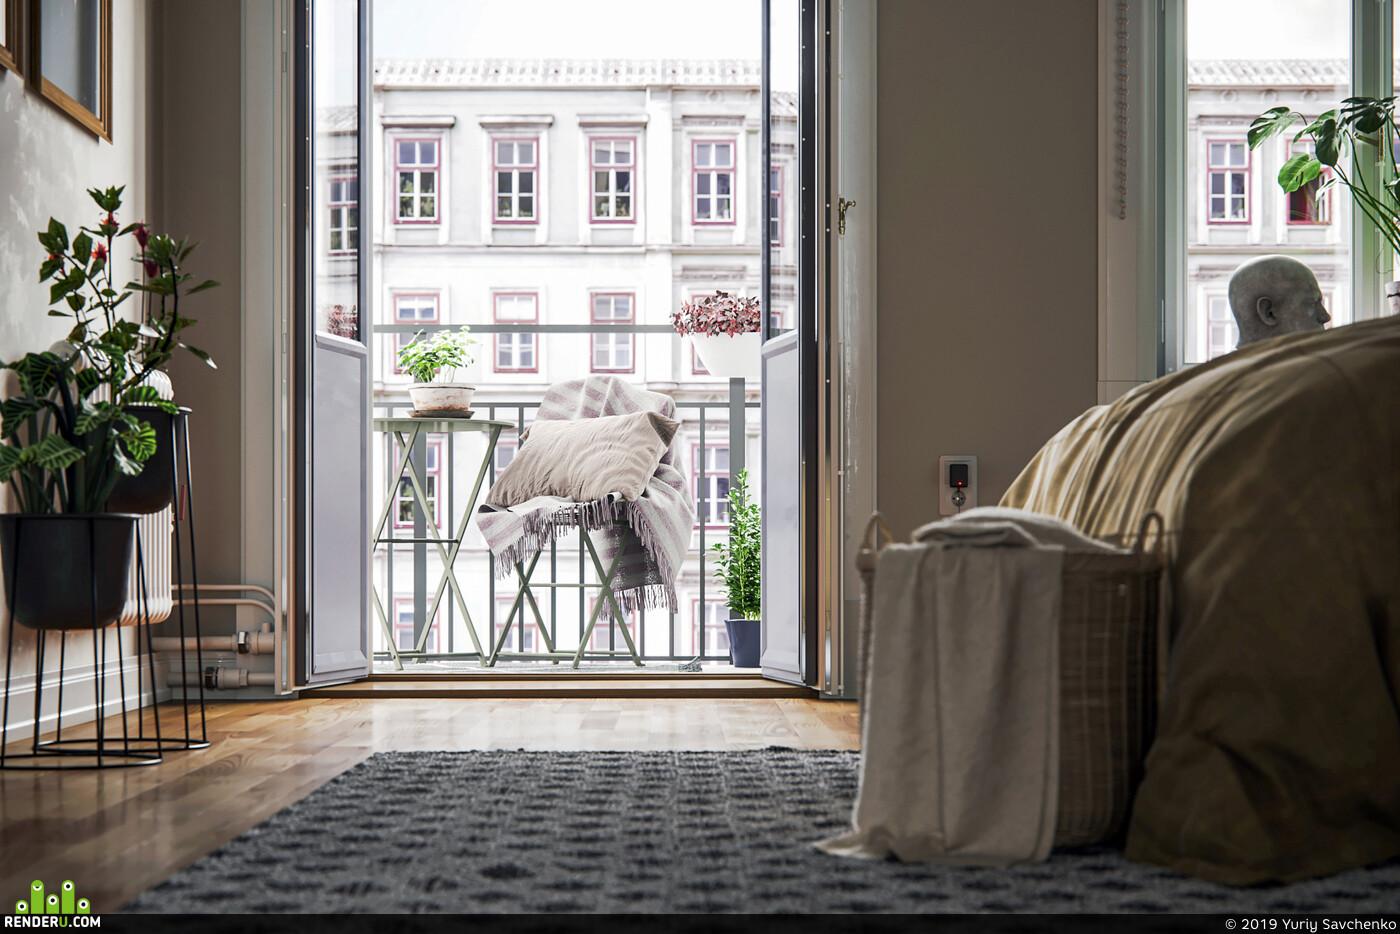 apartment, cgi, cgipark, sweden, gothenburg, bedroom, scandinavian, interior design